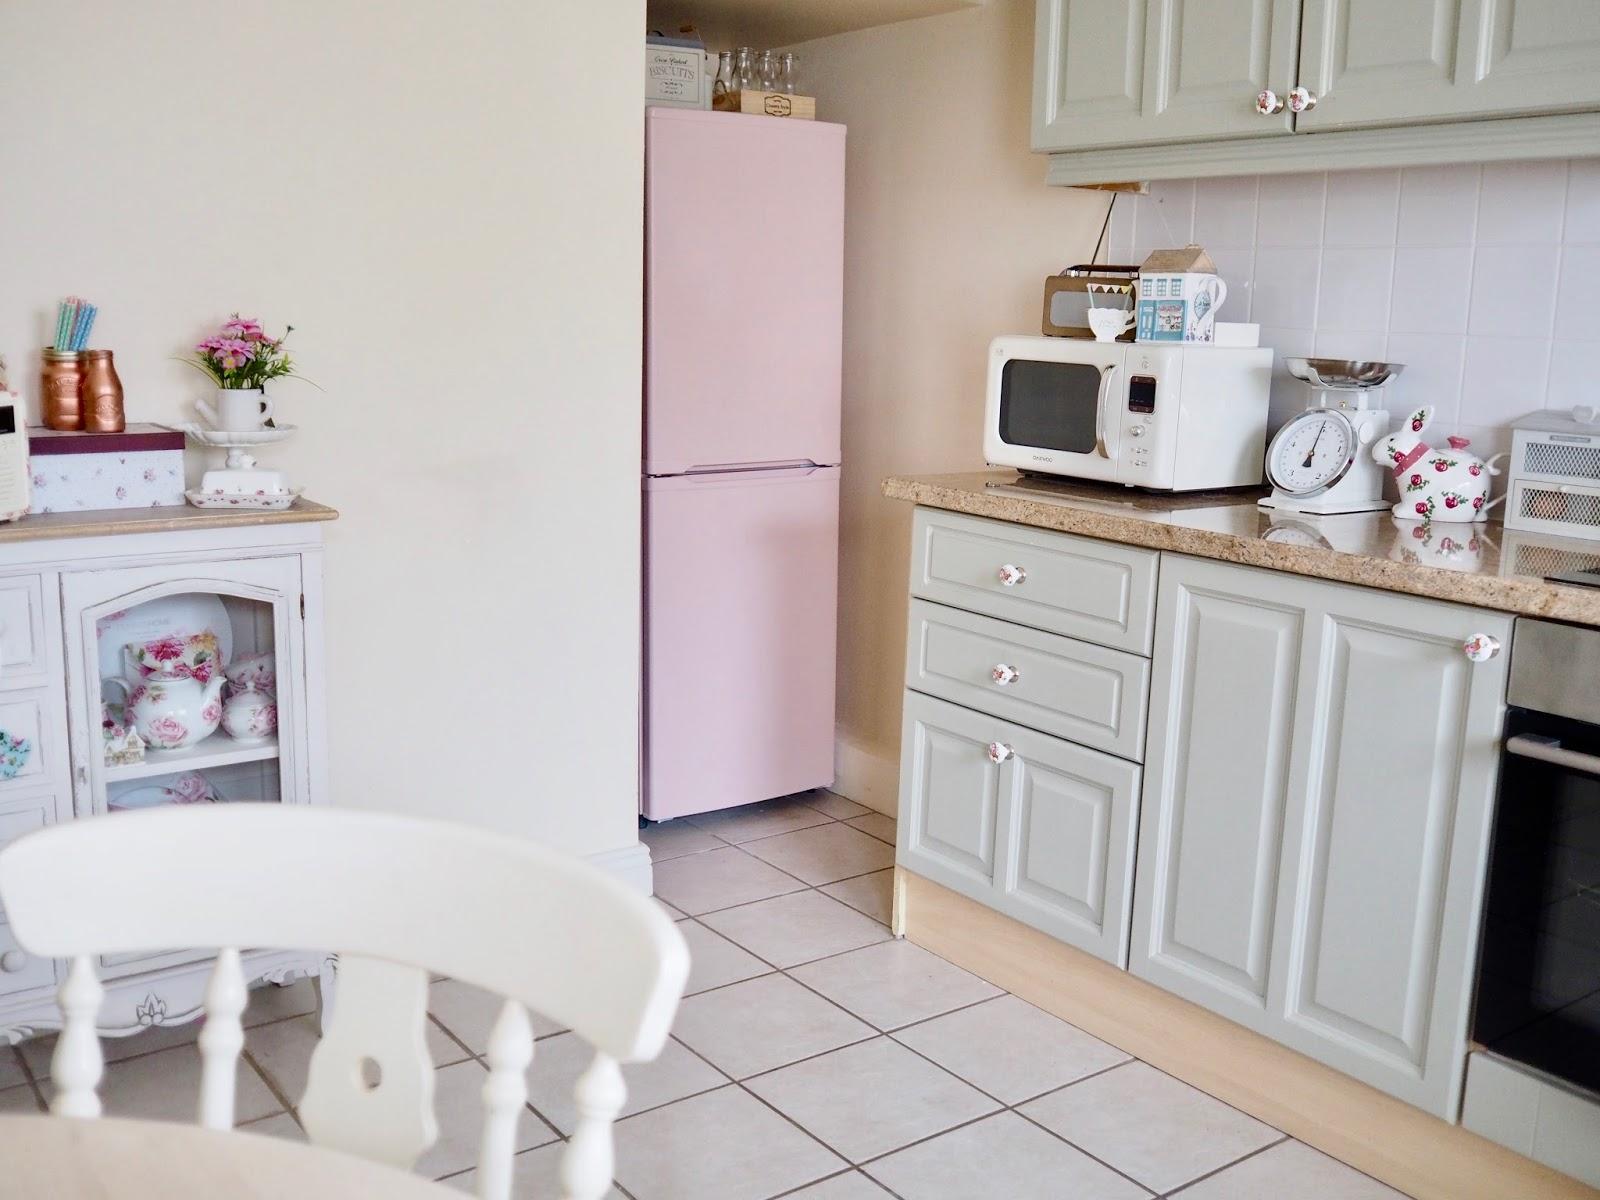 Dorable Pink Retro Kitchen Image - Kitchen Cabinets | Ideas ...